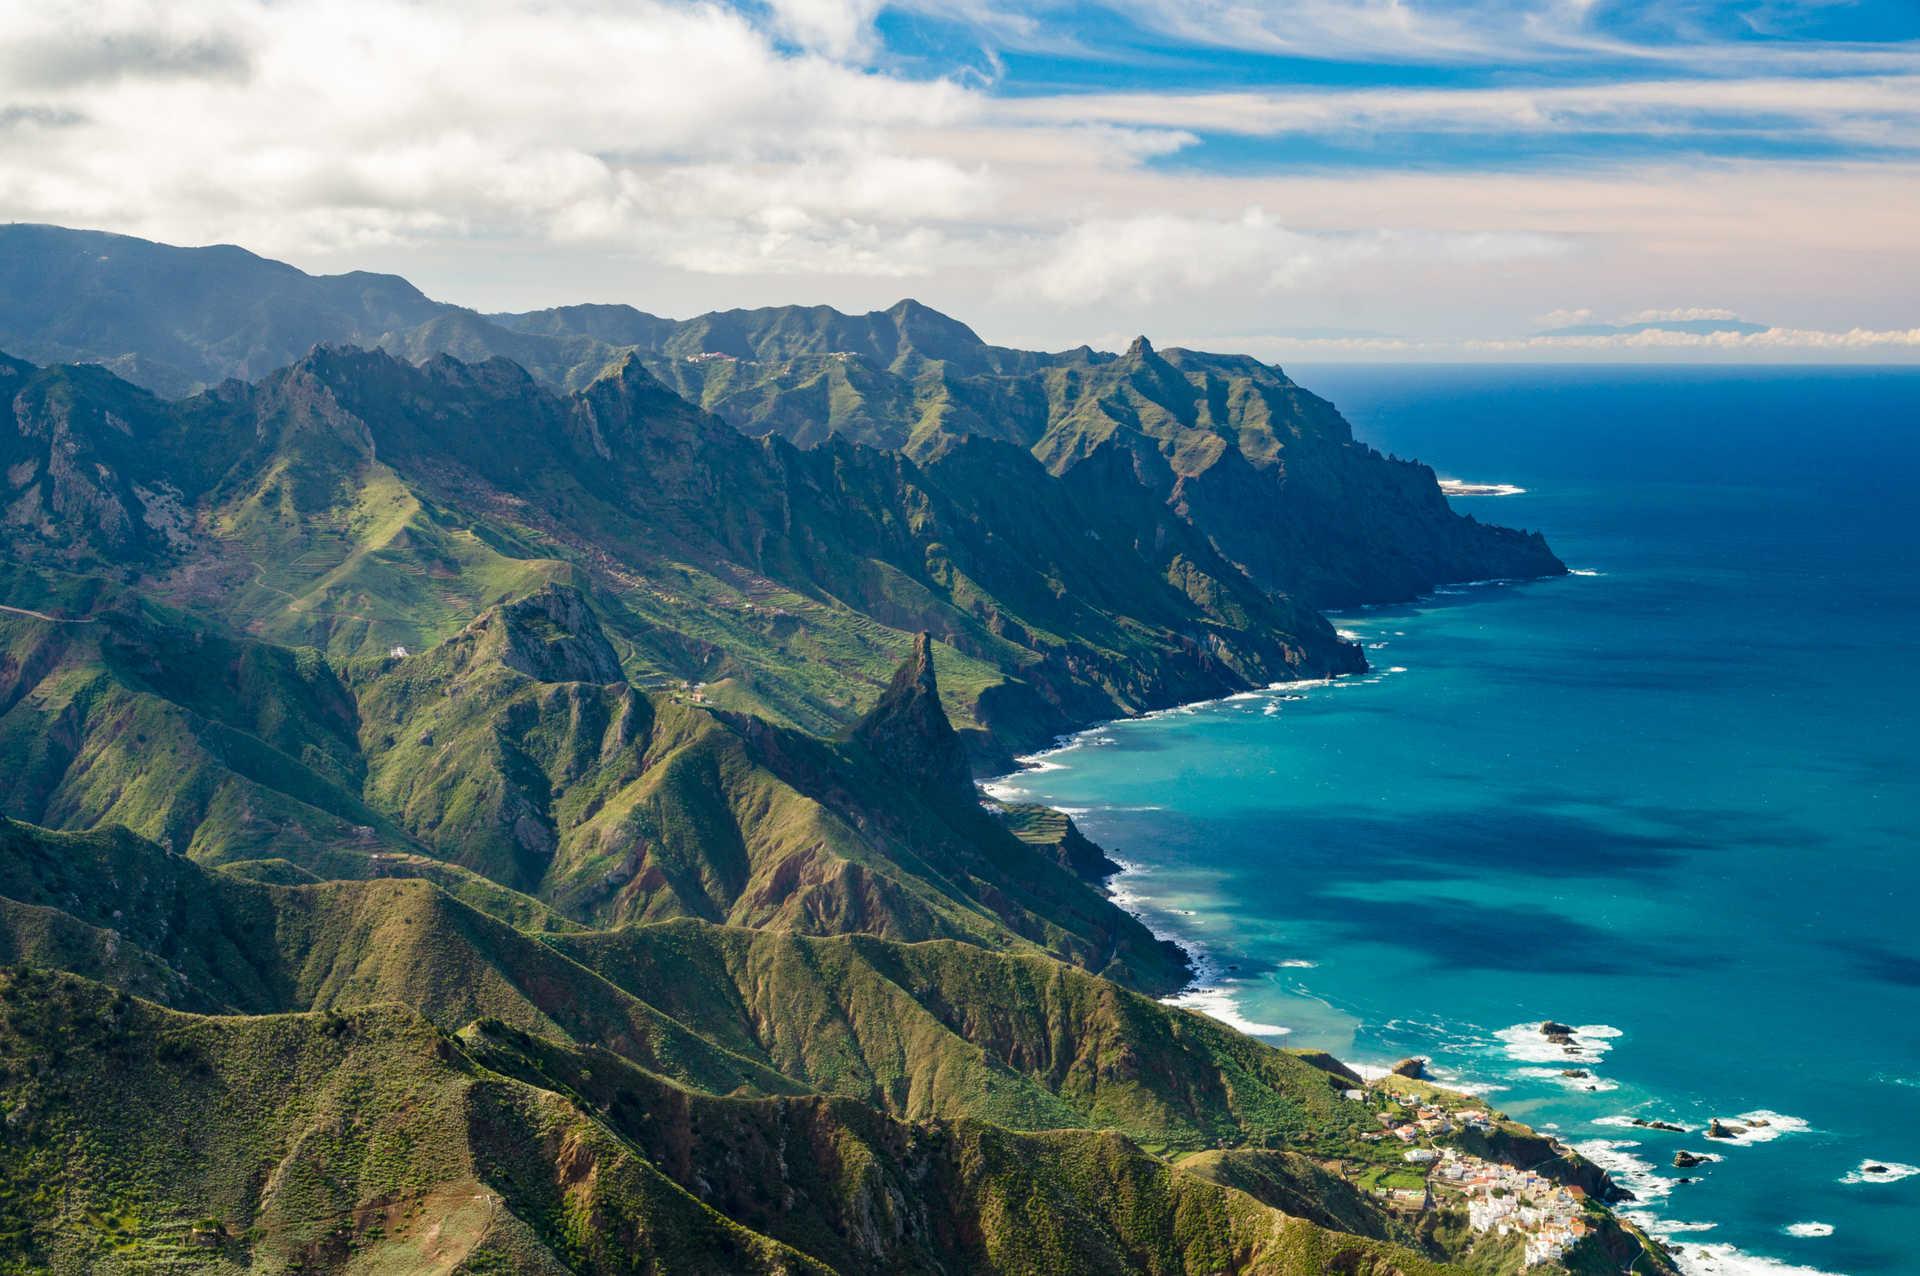 Montagnes d'Anaga à Tenerife